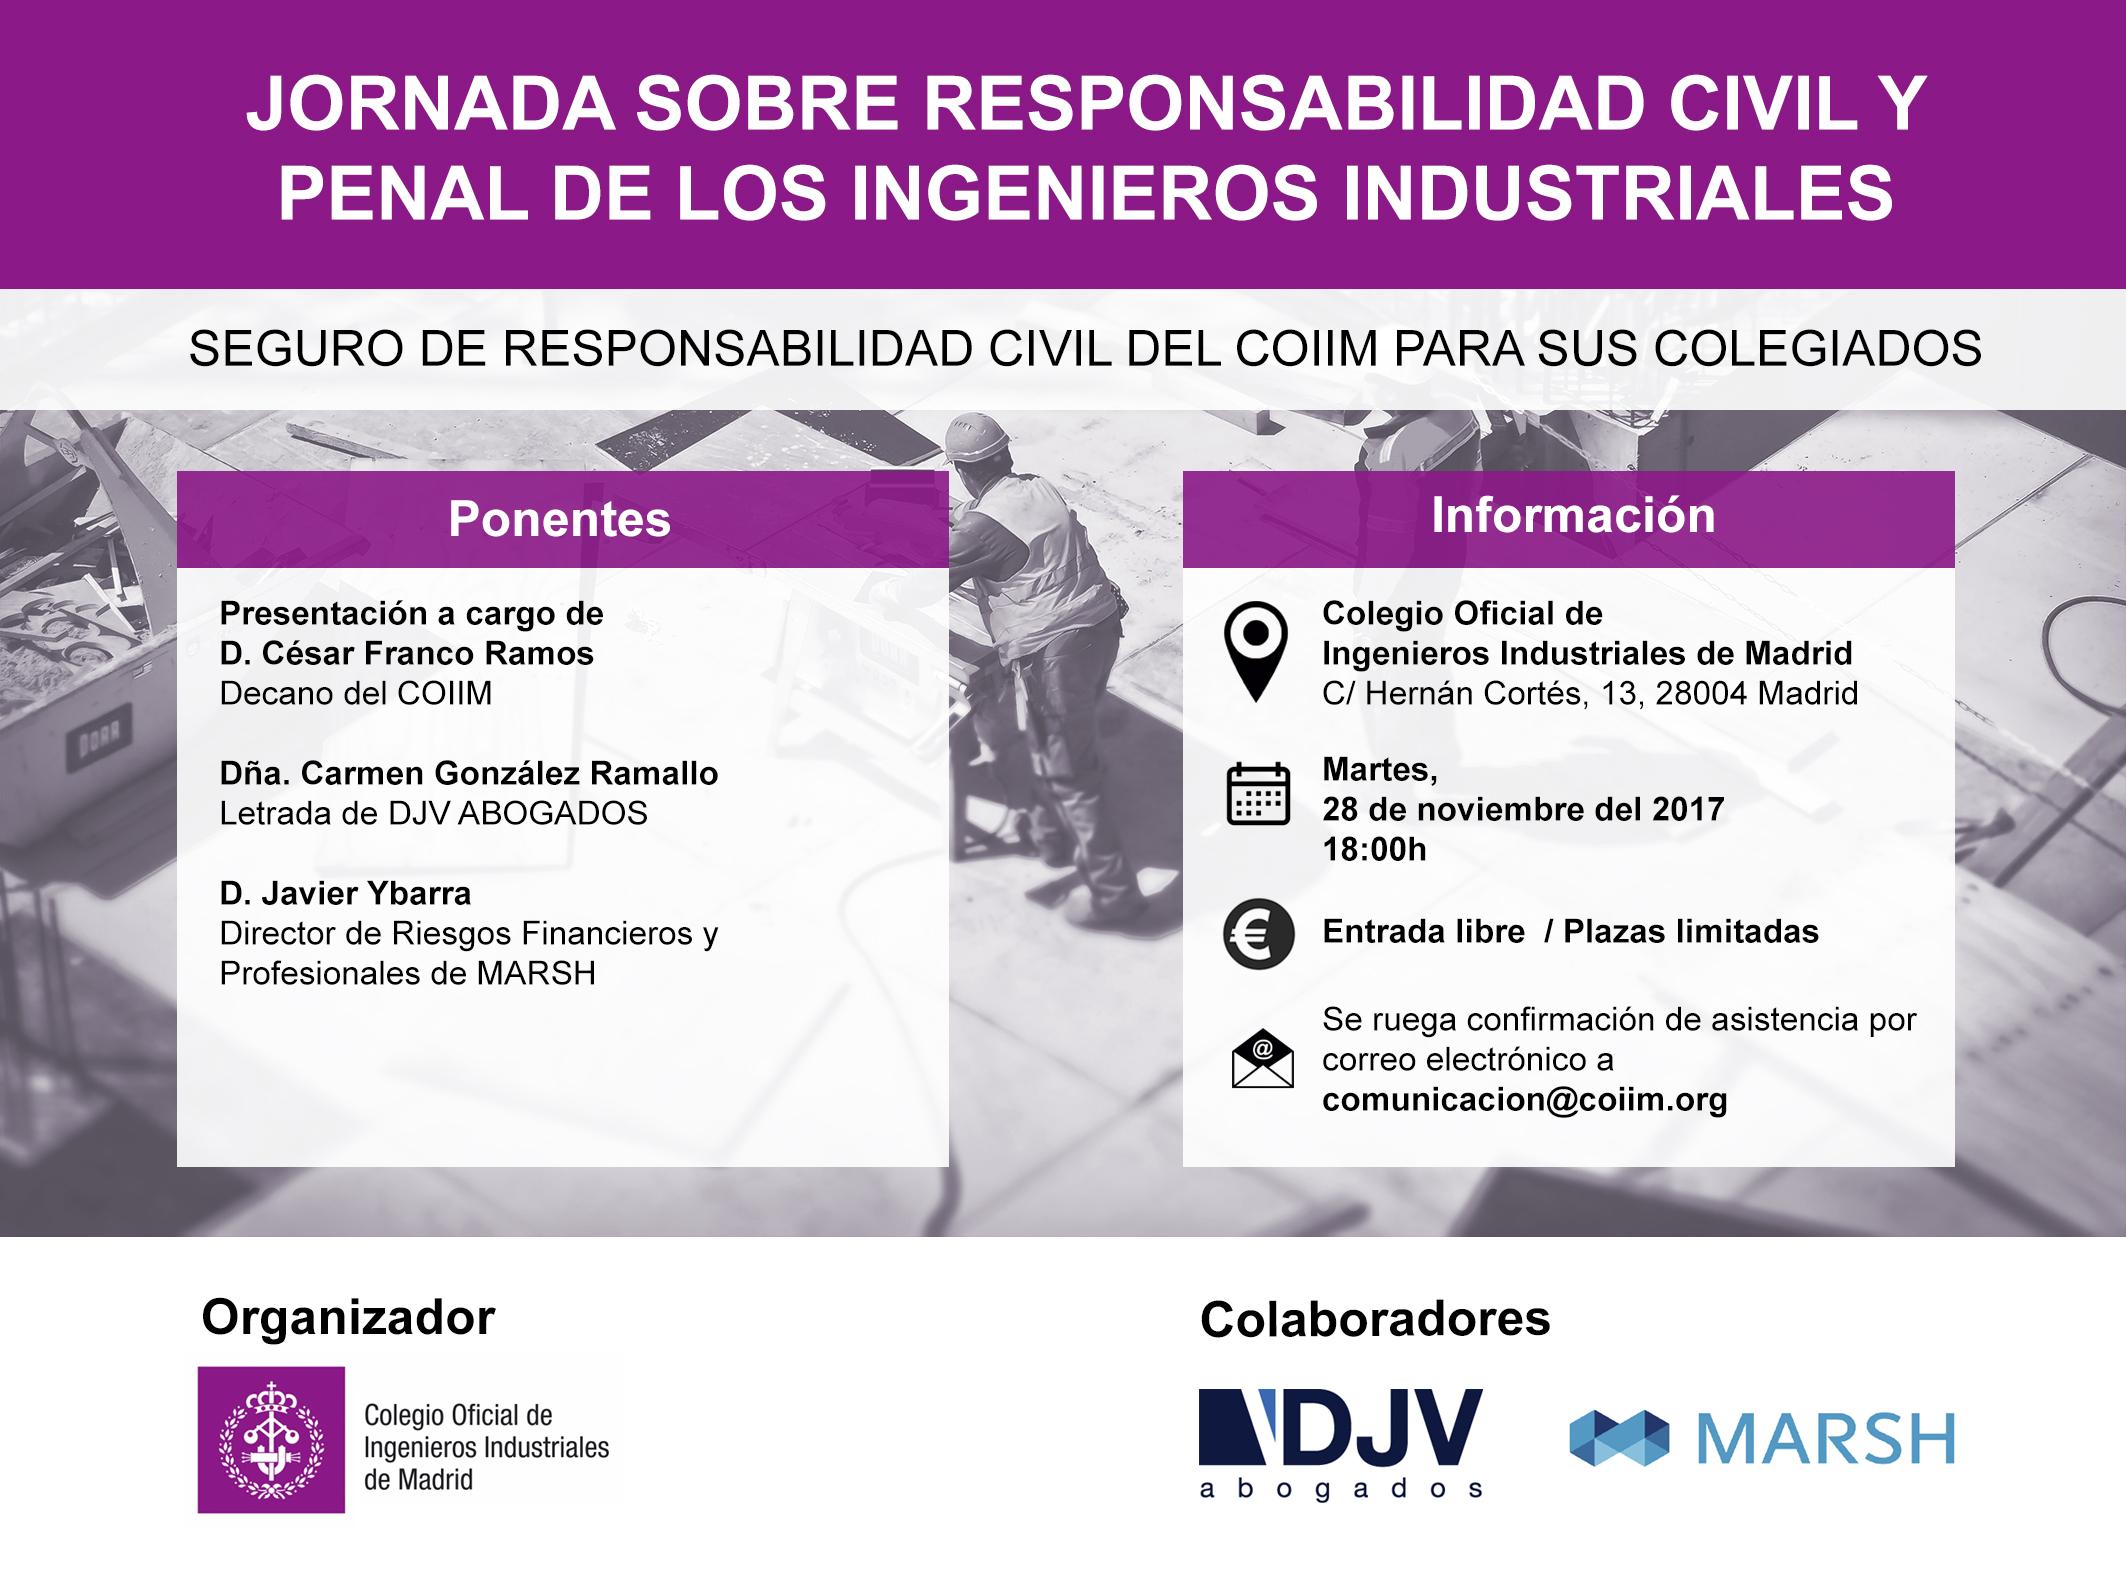 Coiim Responsabilidad Civil Penal Ingenieros Industriales